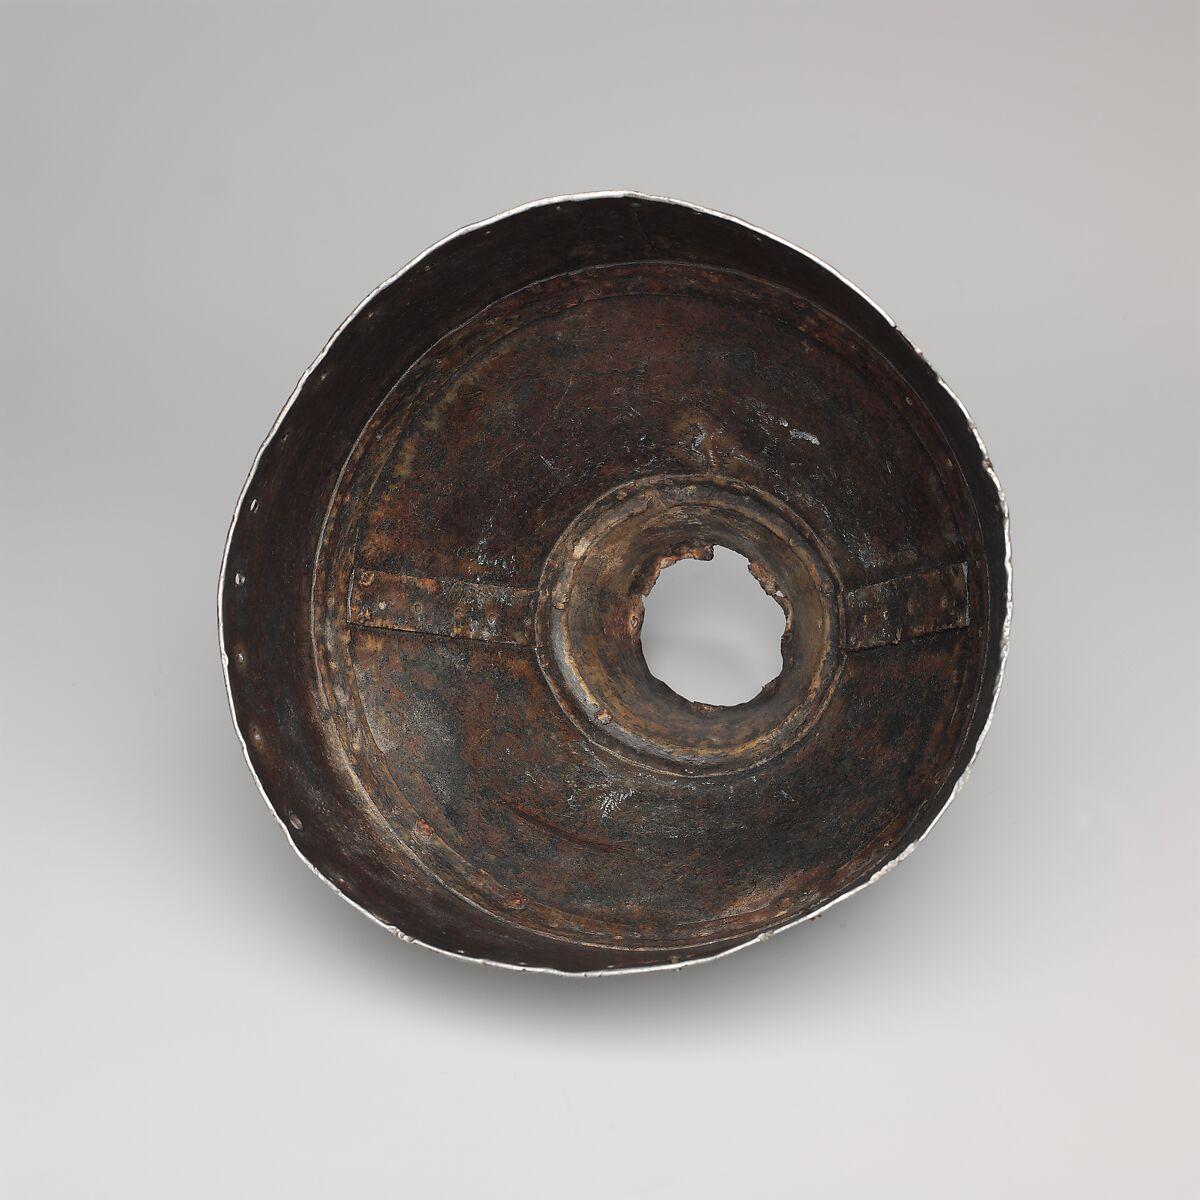 Helmet (rmog), Iron, gold, silver, copper, Mongolian